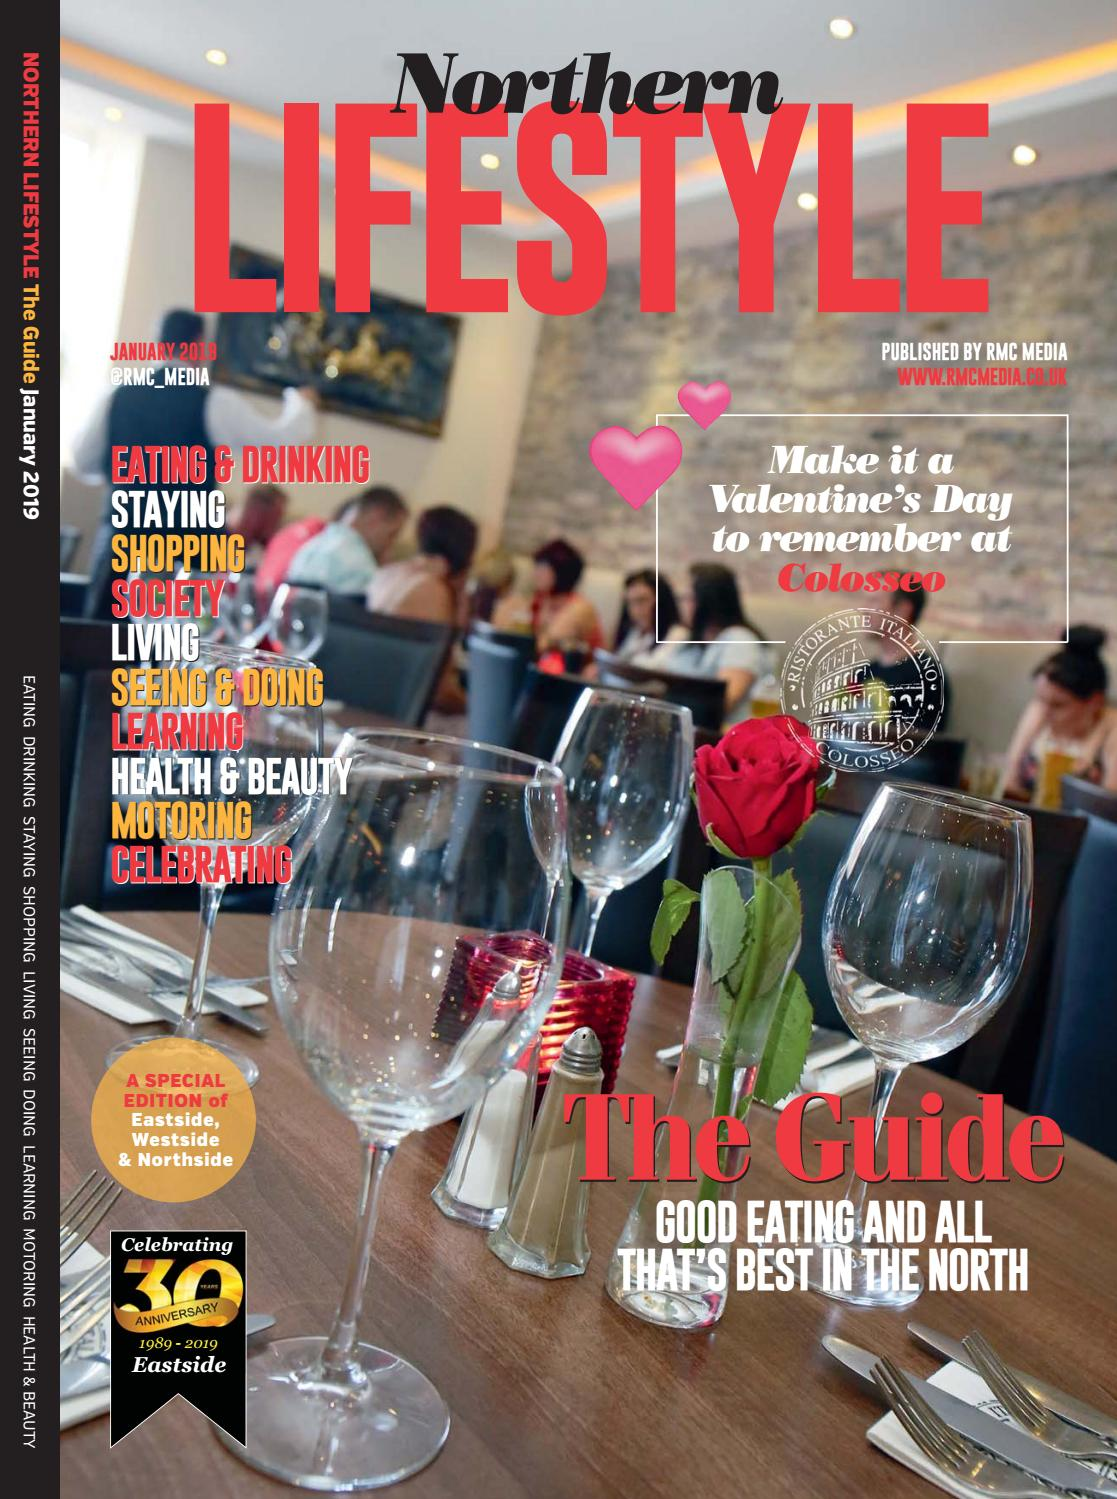 Northern Lifestyle (Eastside) January 2019 by RMC Media - issuu c9ba788be5